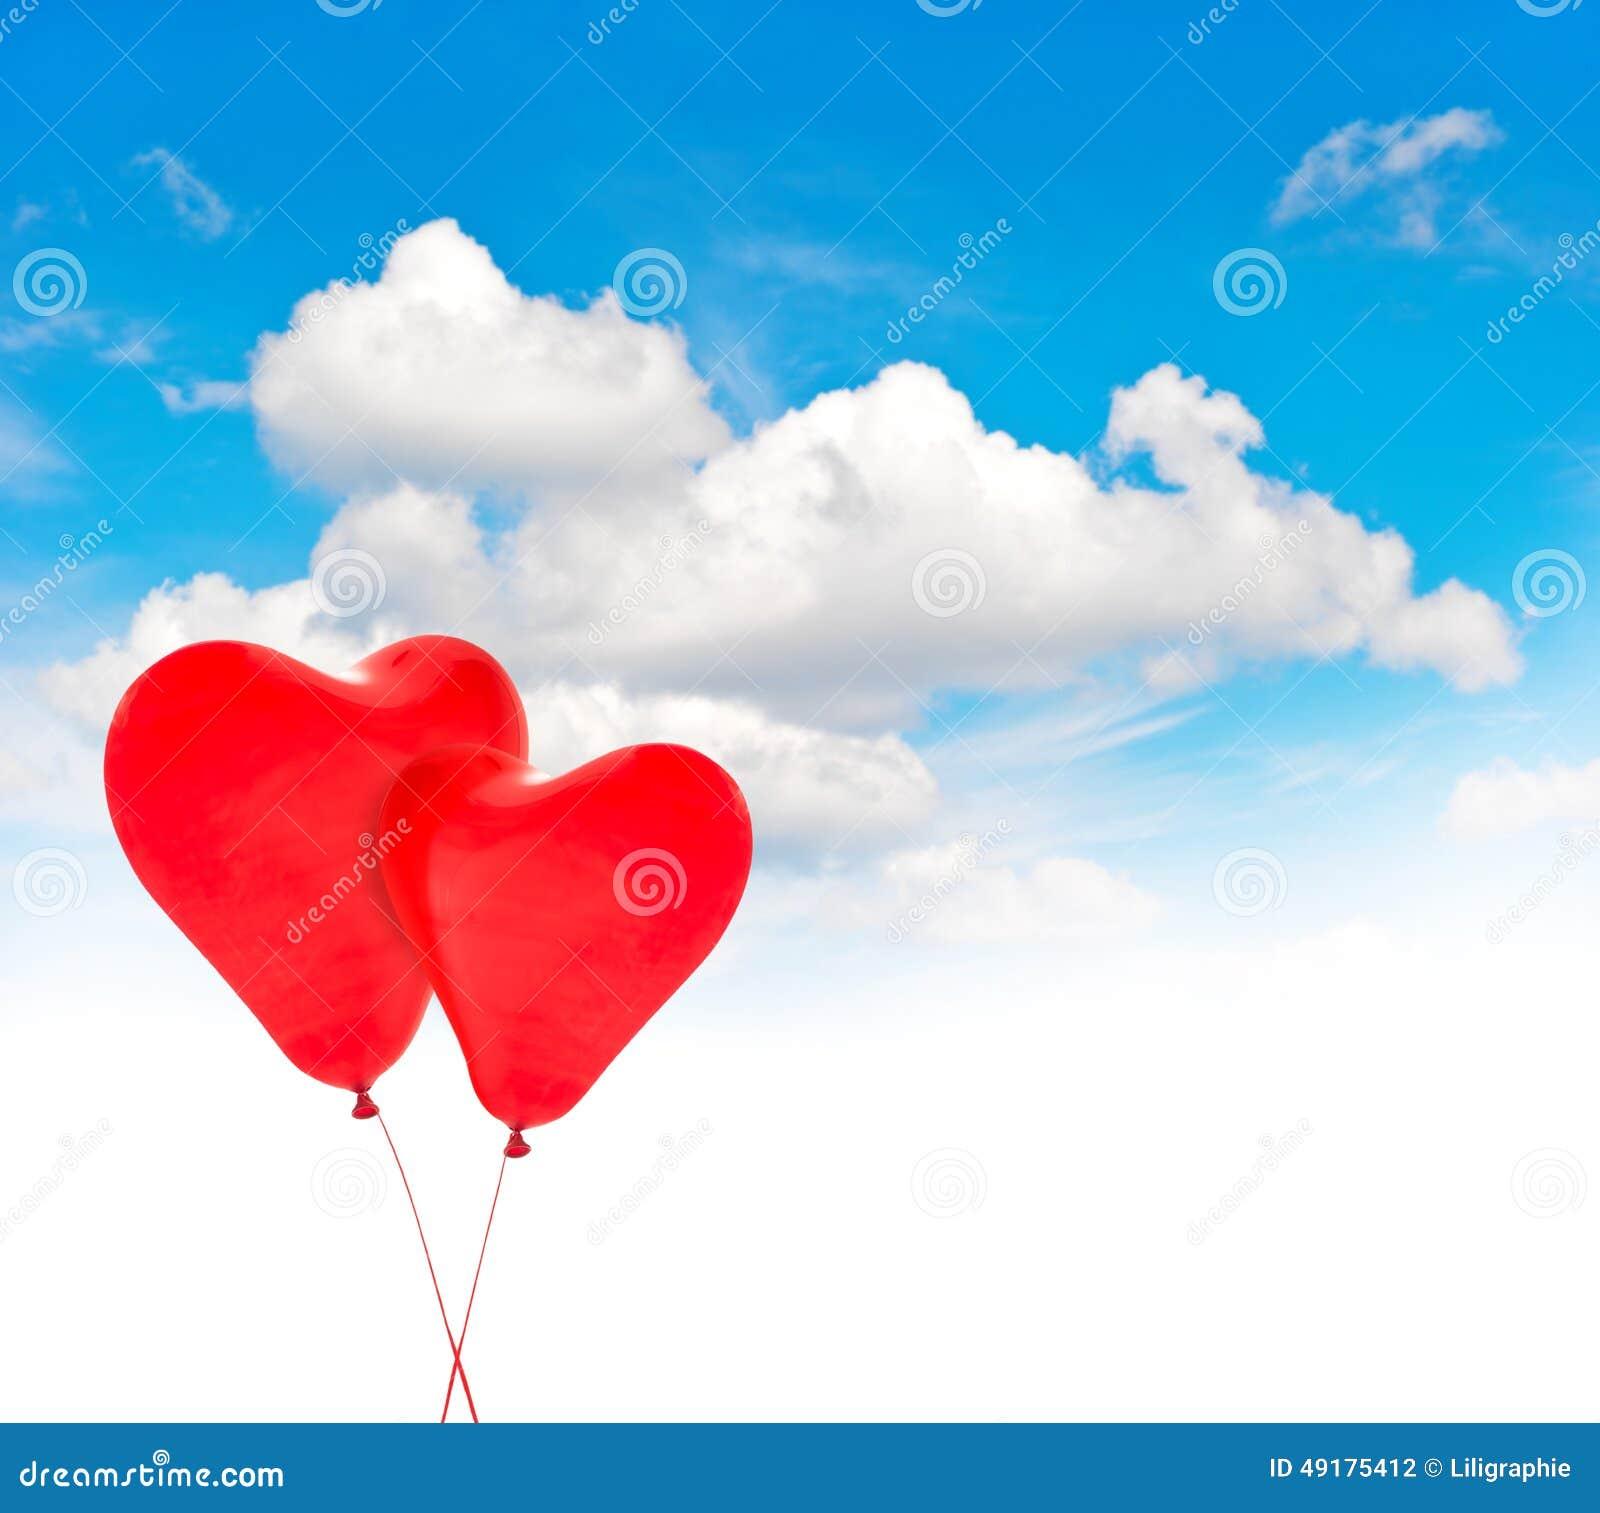 desktop wallpaper valentine heart balloons - photo #21